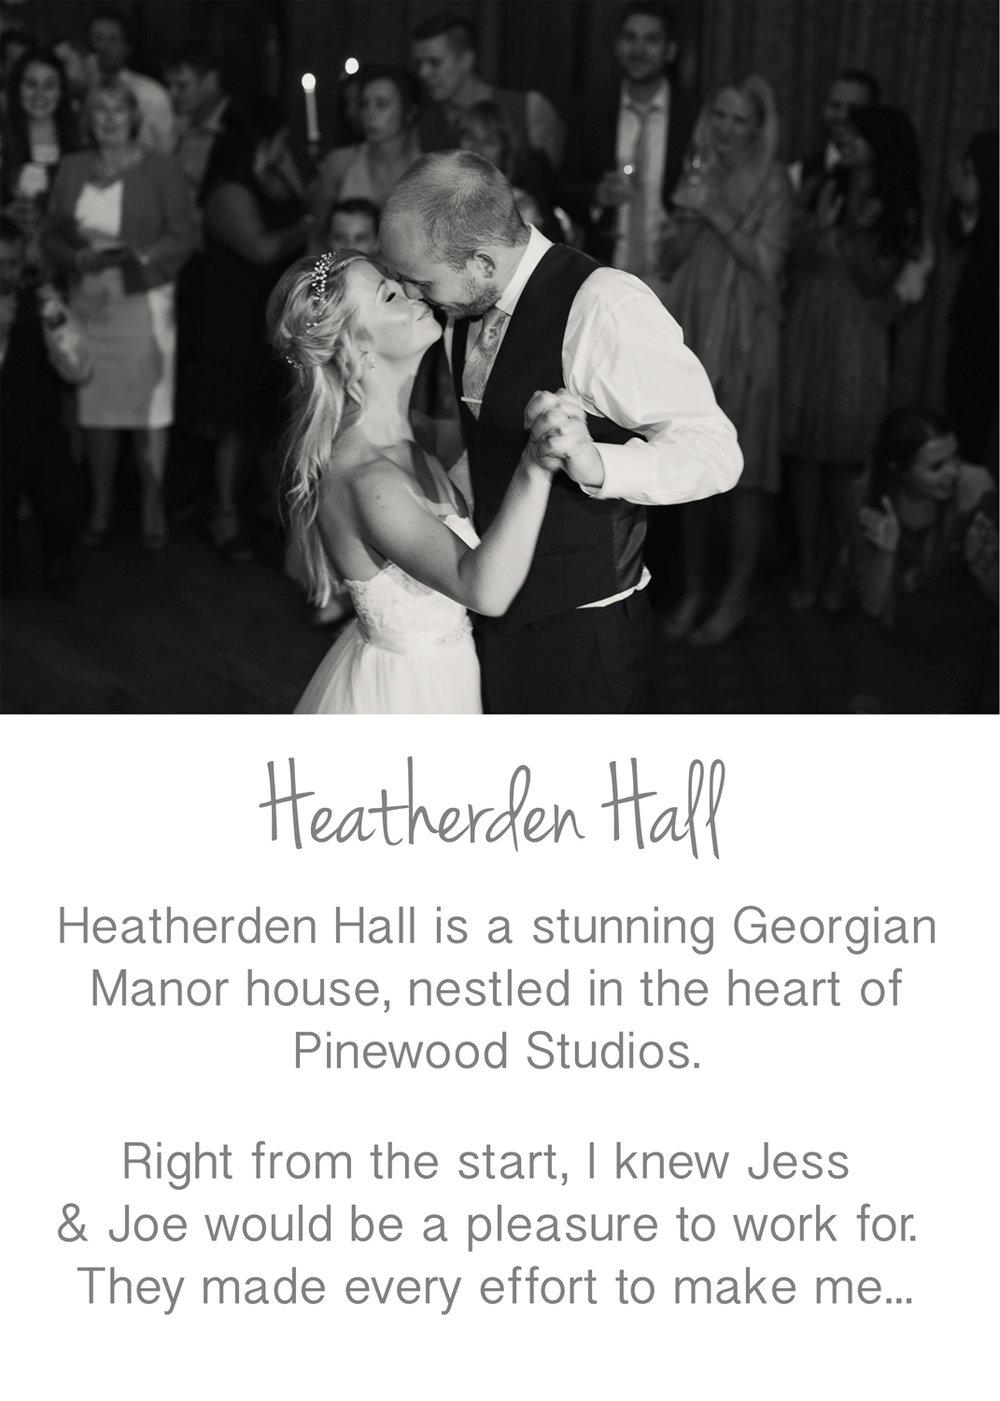 heatherden-hall.jpg